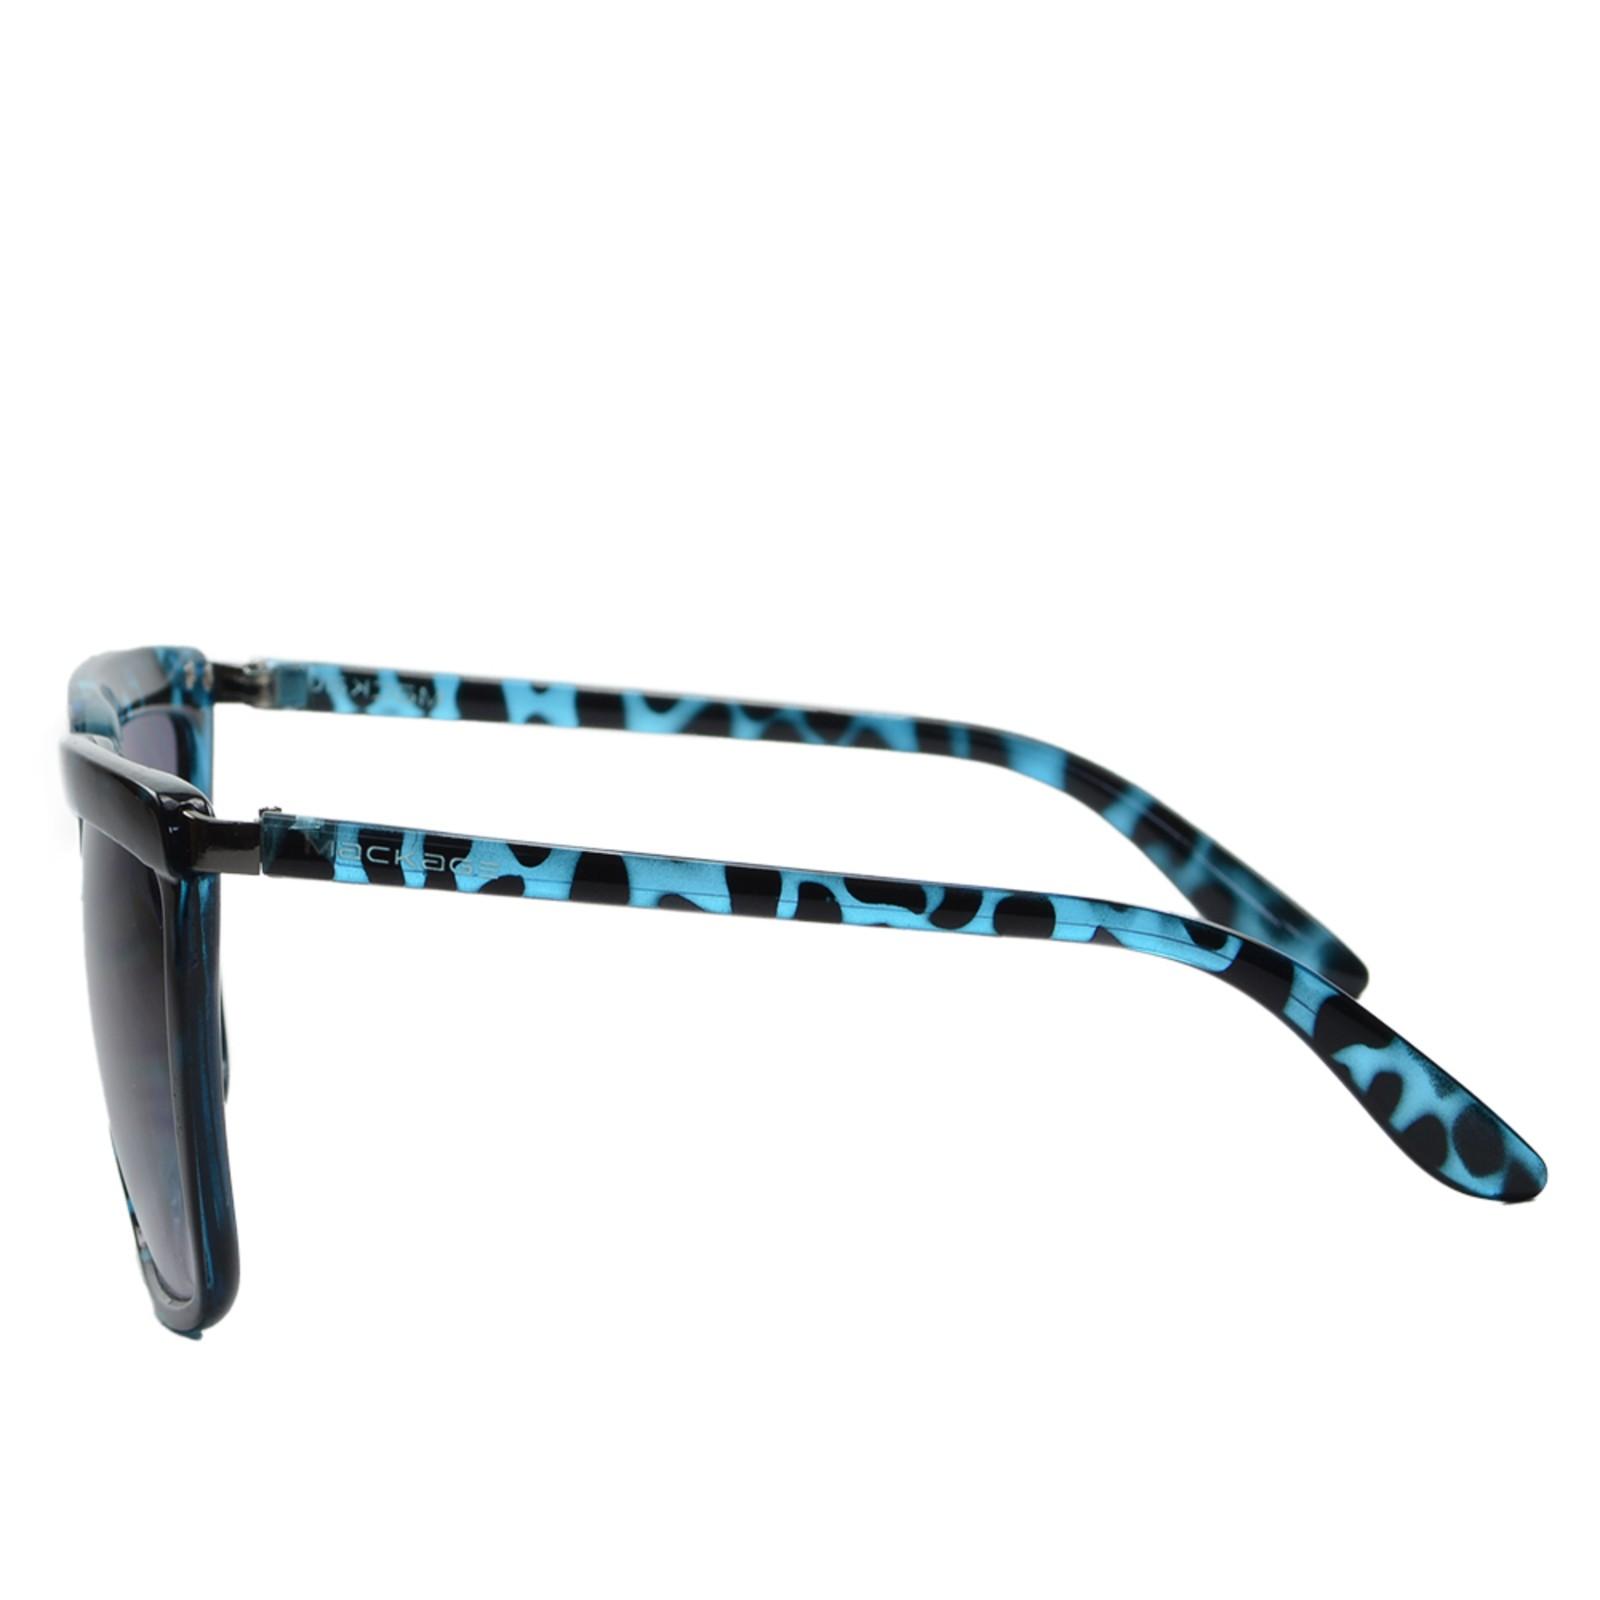 Óculos de Sol Mackage Feminino Acetato Retangular - Azul Efeito Tartaruga